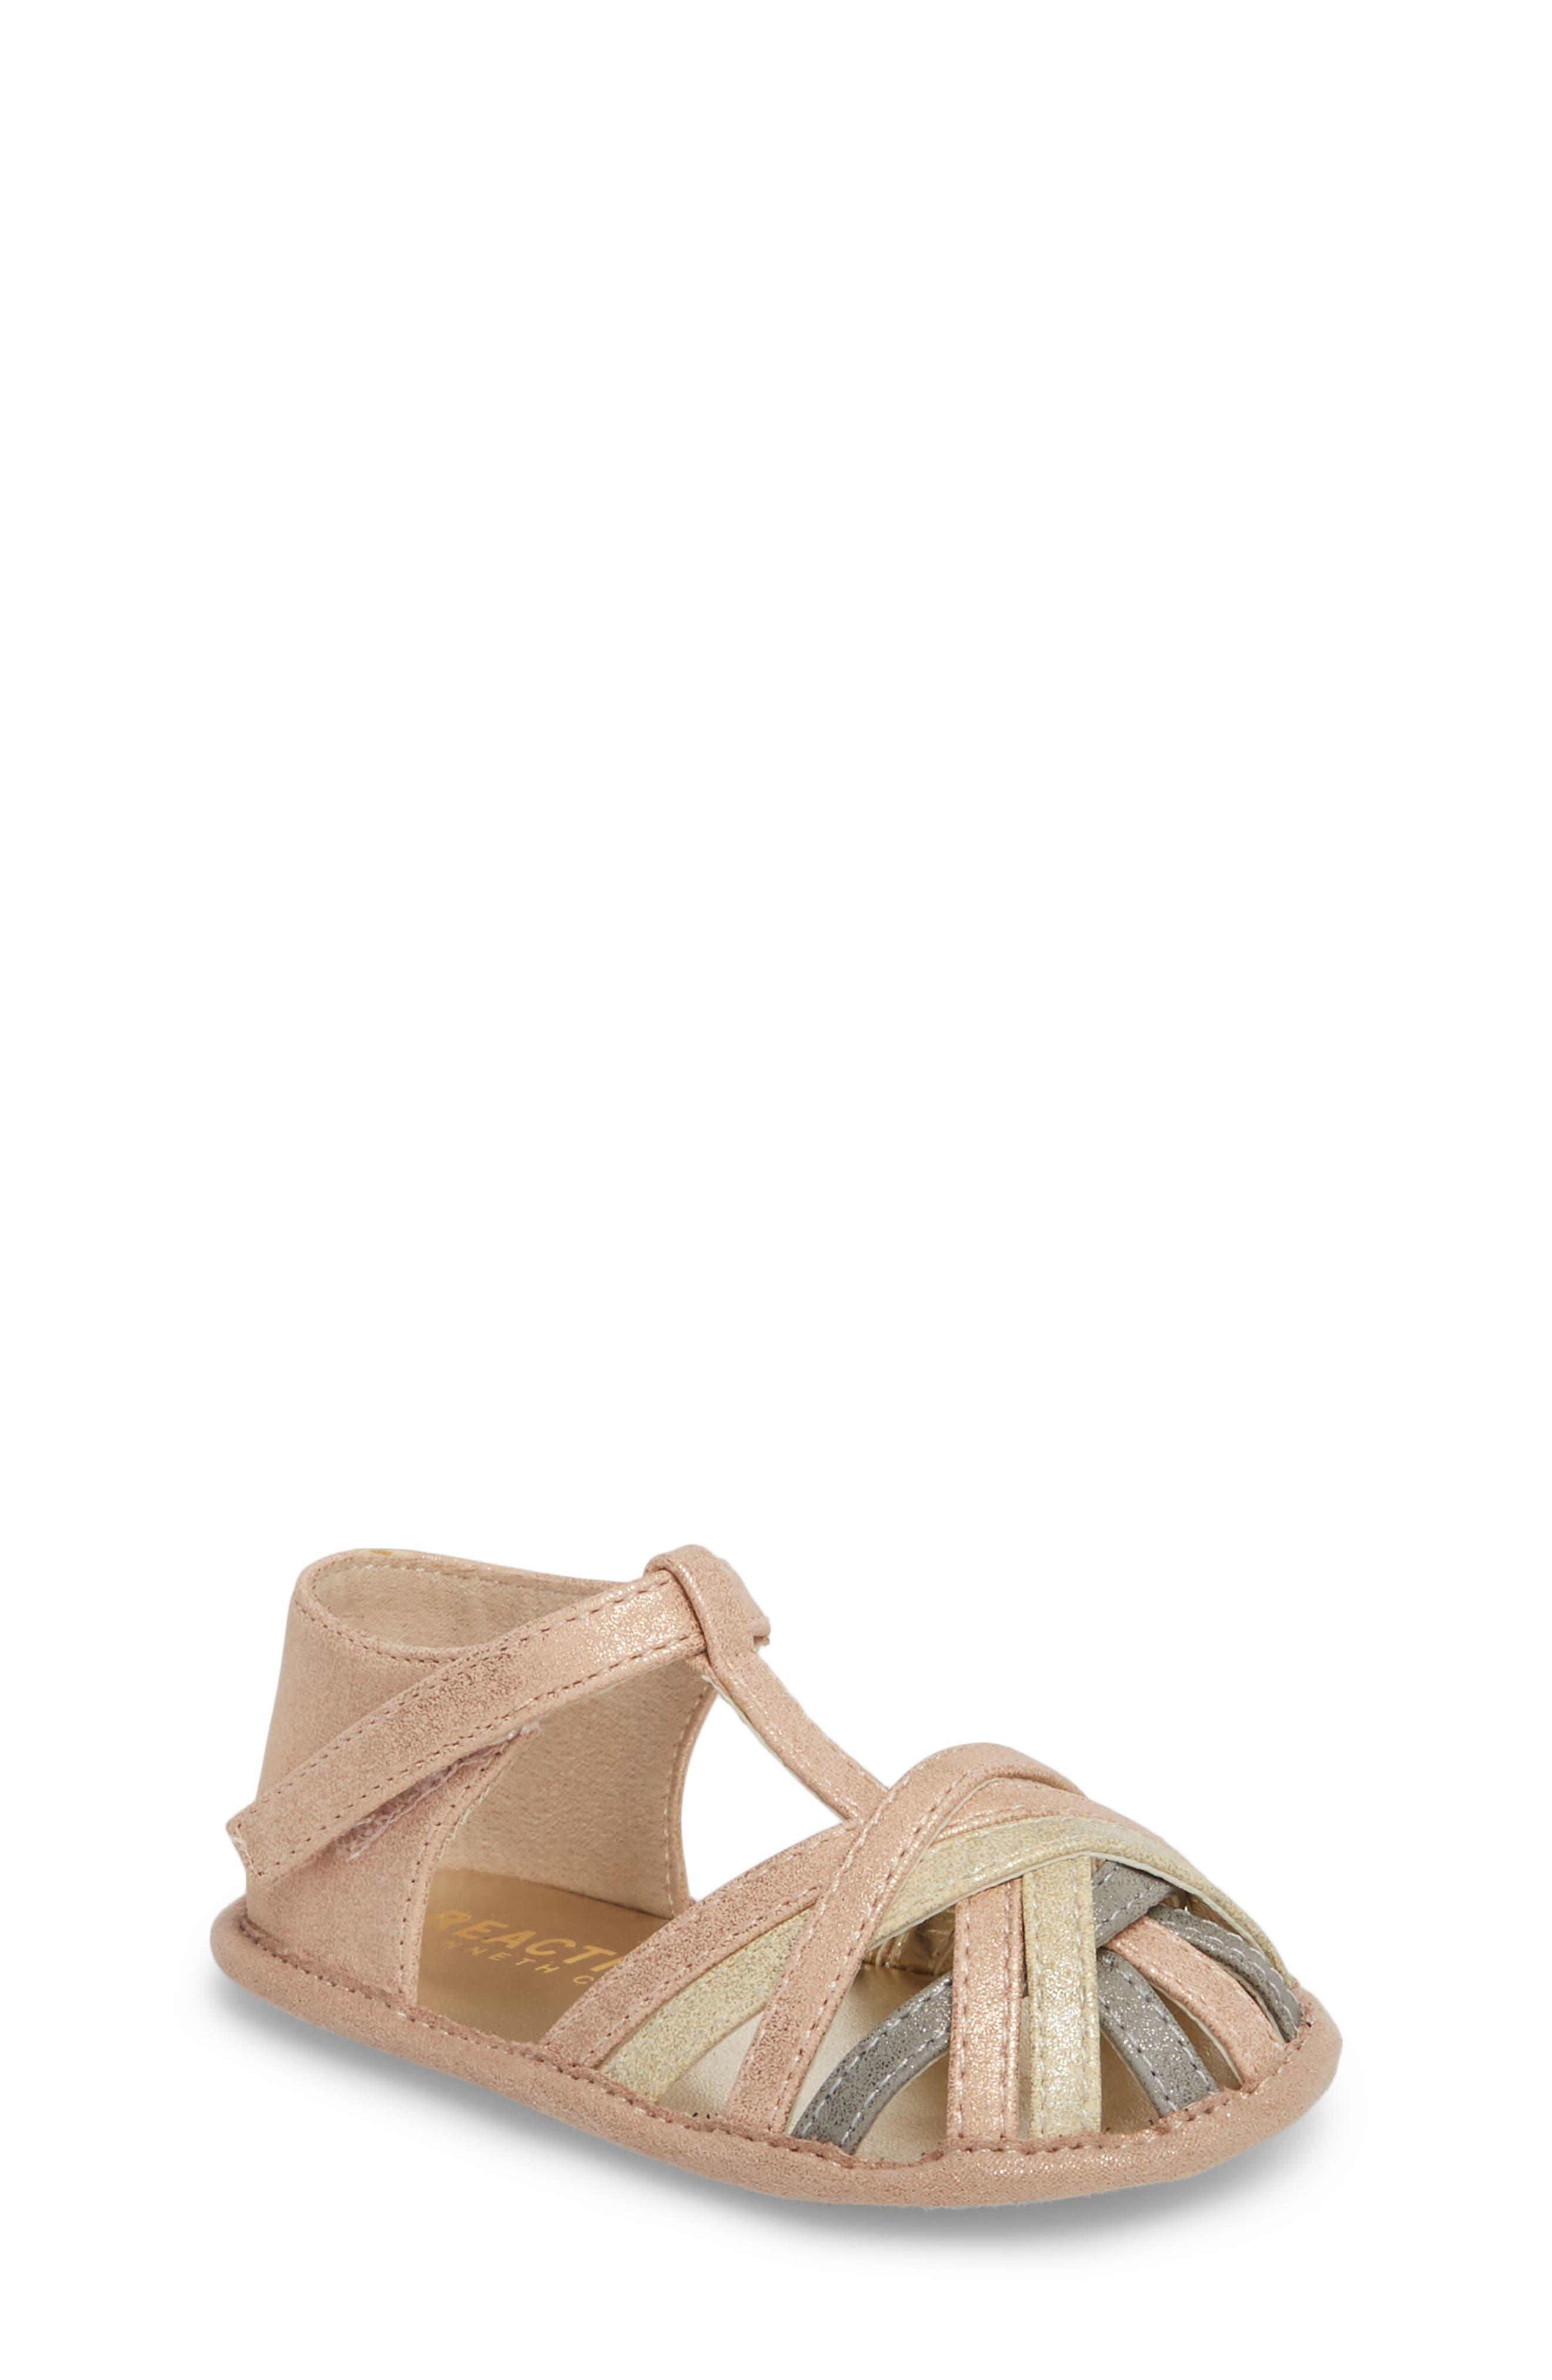 Wisp Metallic Sandal,                             Main thumbnail 1, color,                             220